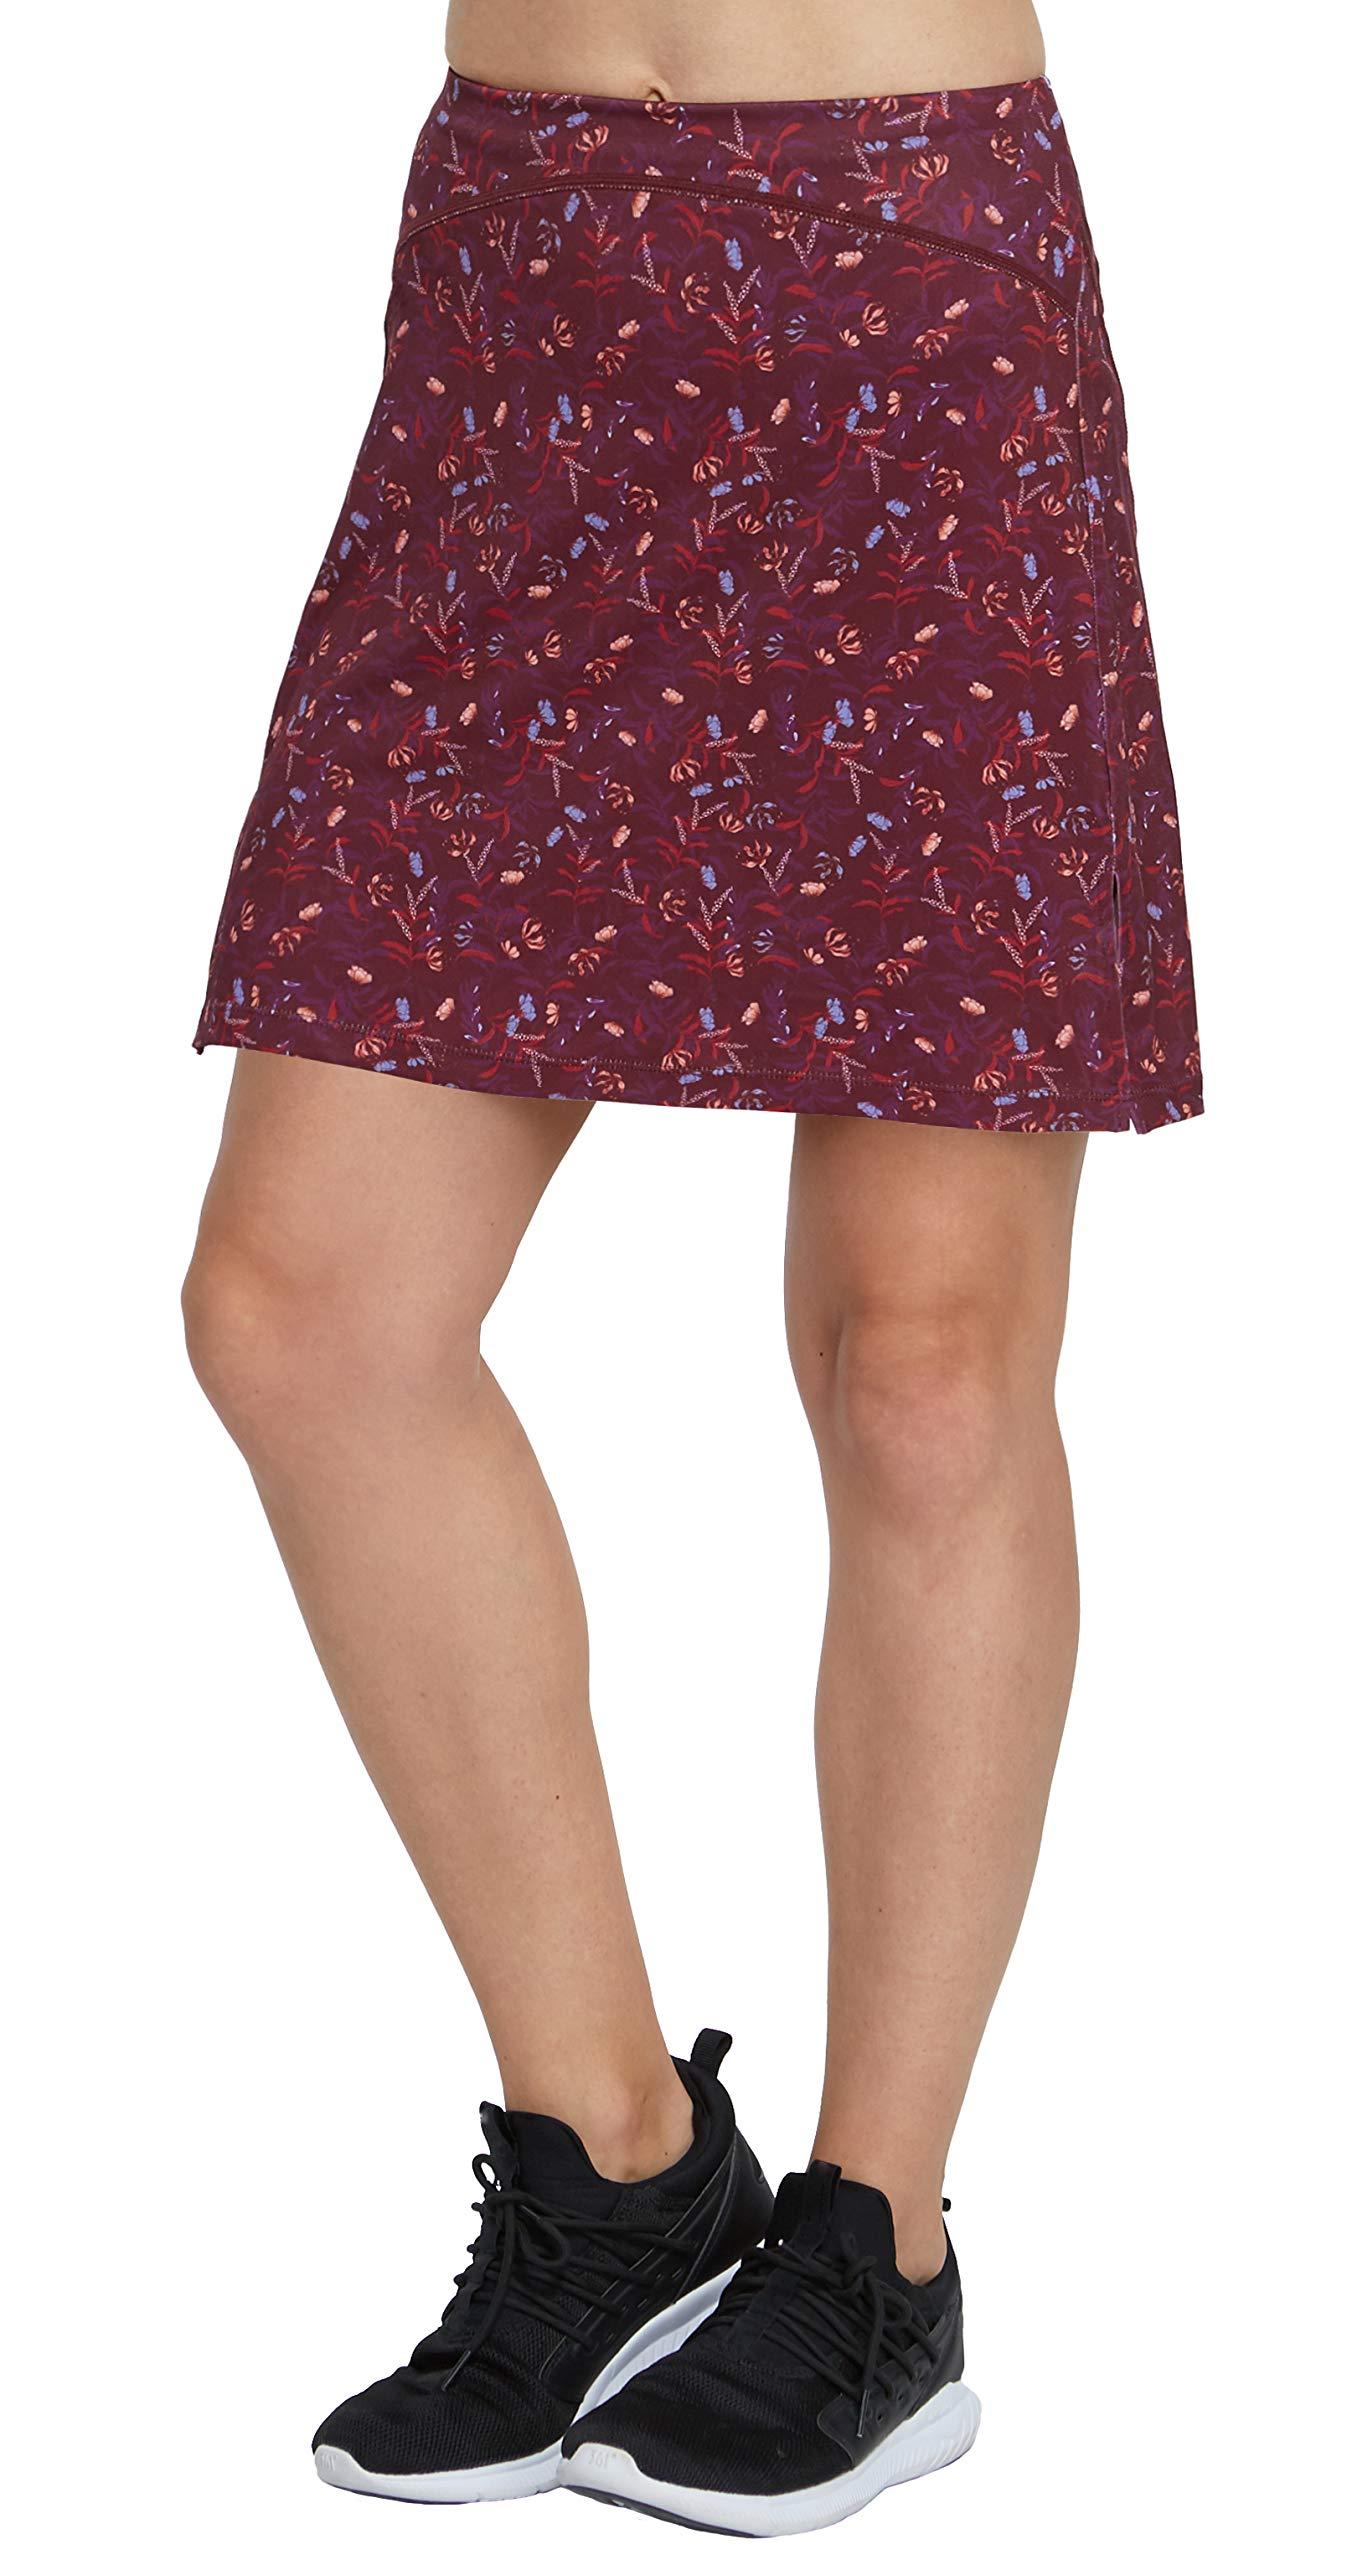 slimour Women Modest Running Skirt Travel Skirts with Pocket High Waist Skorts